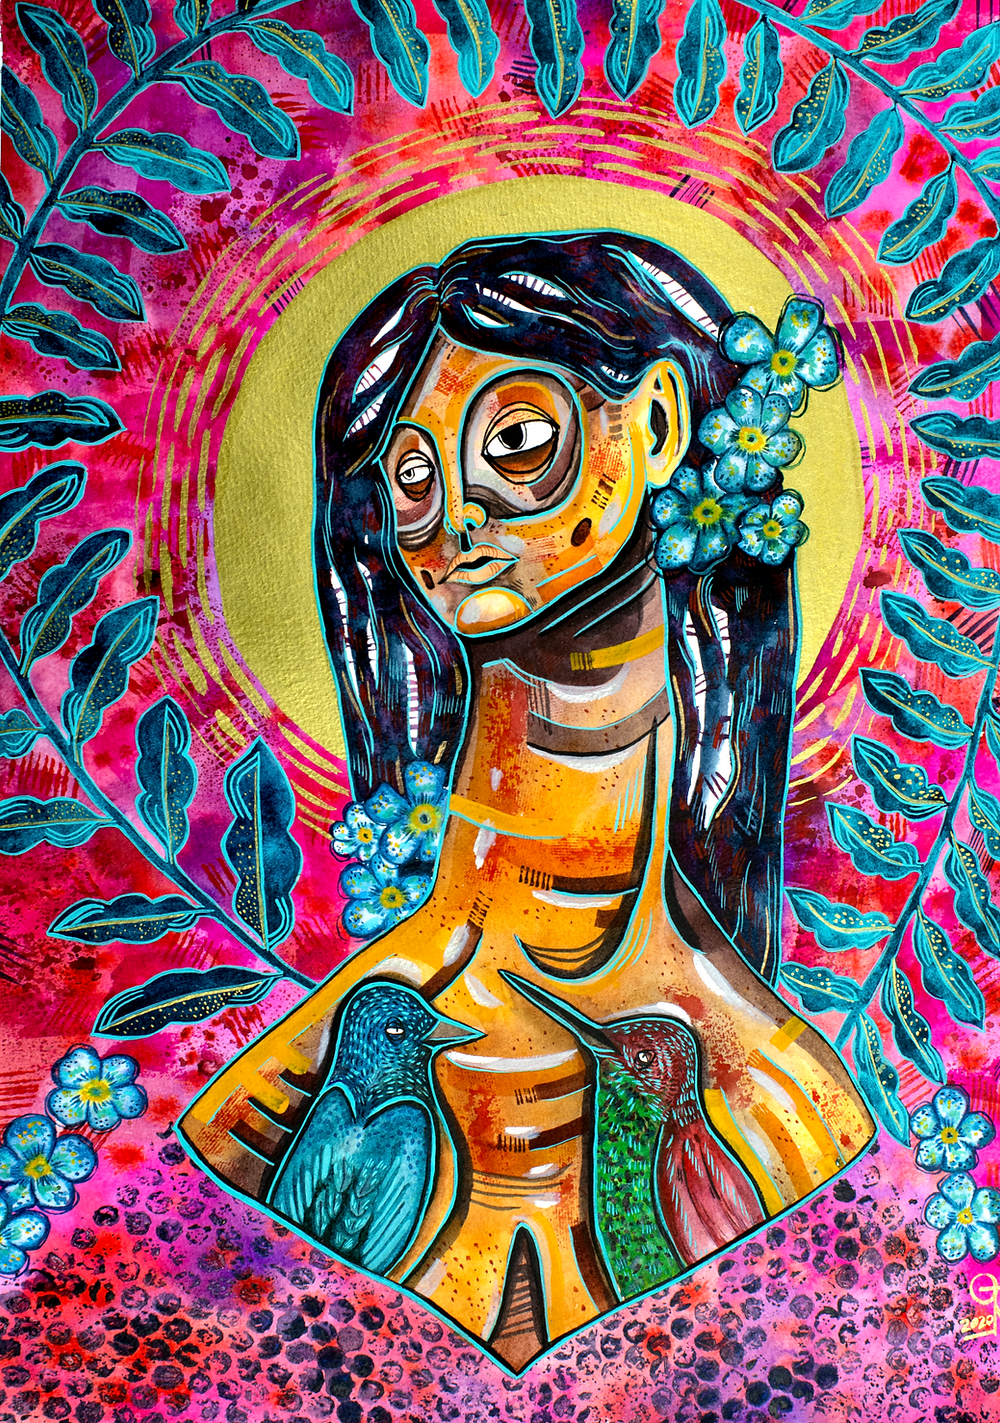 expresive watercolor woman portrait, watercolor painting, watercolor birds